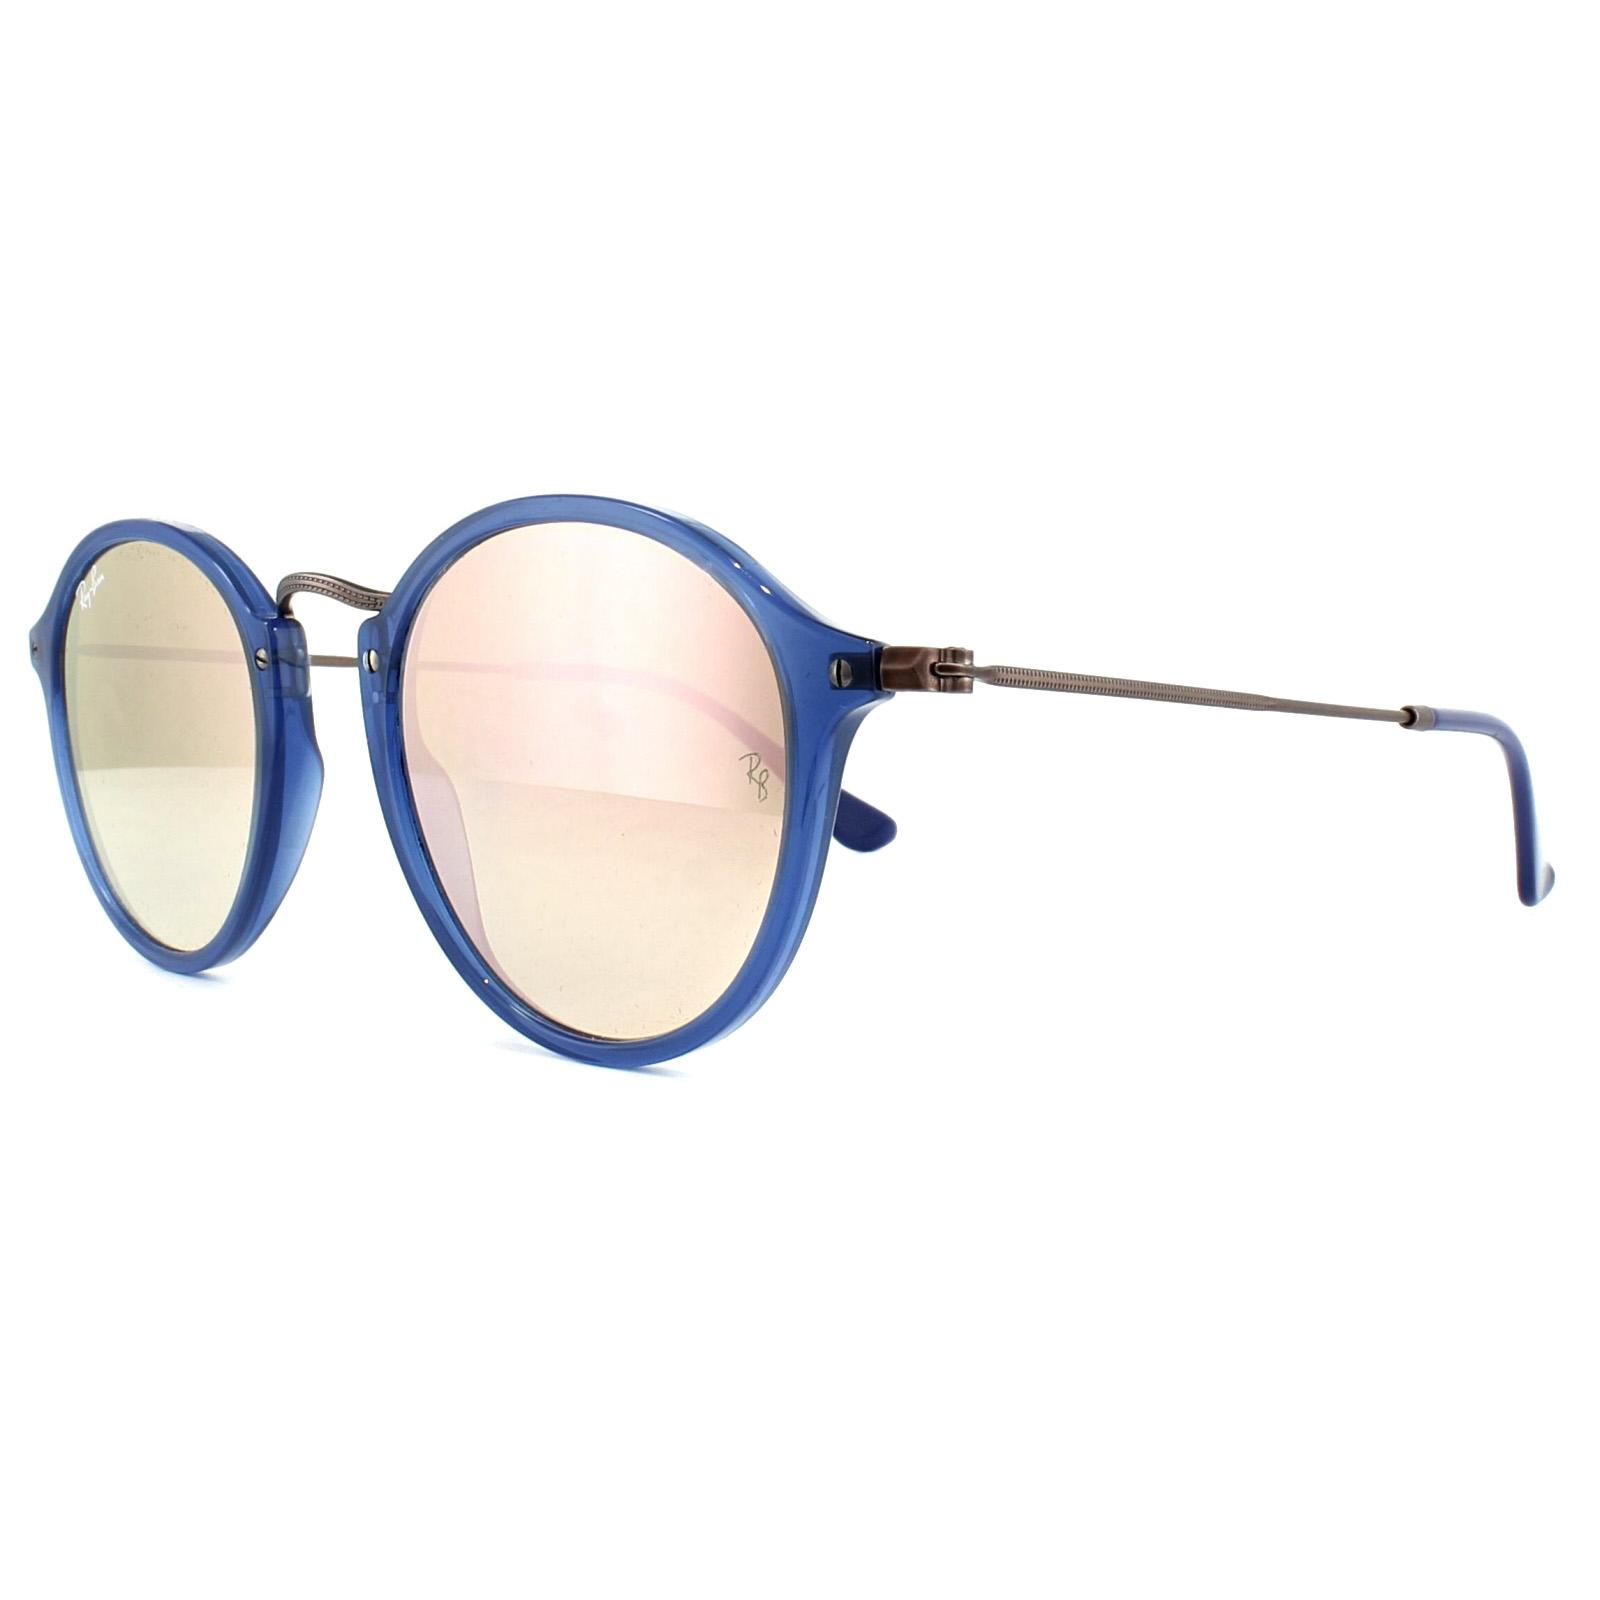 d006183318 Sentinel Ray-Ban Sunglasses 2447N Flat Lenses 62547O Blue Brown Copper  Mirror 49mm